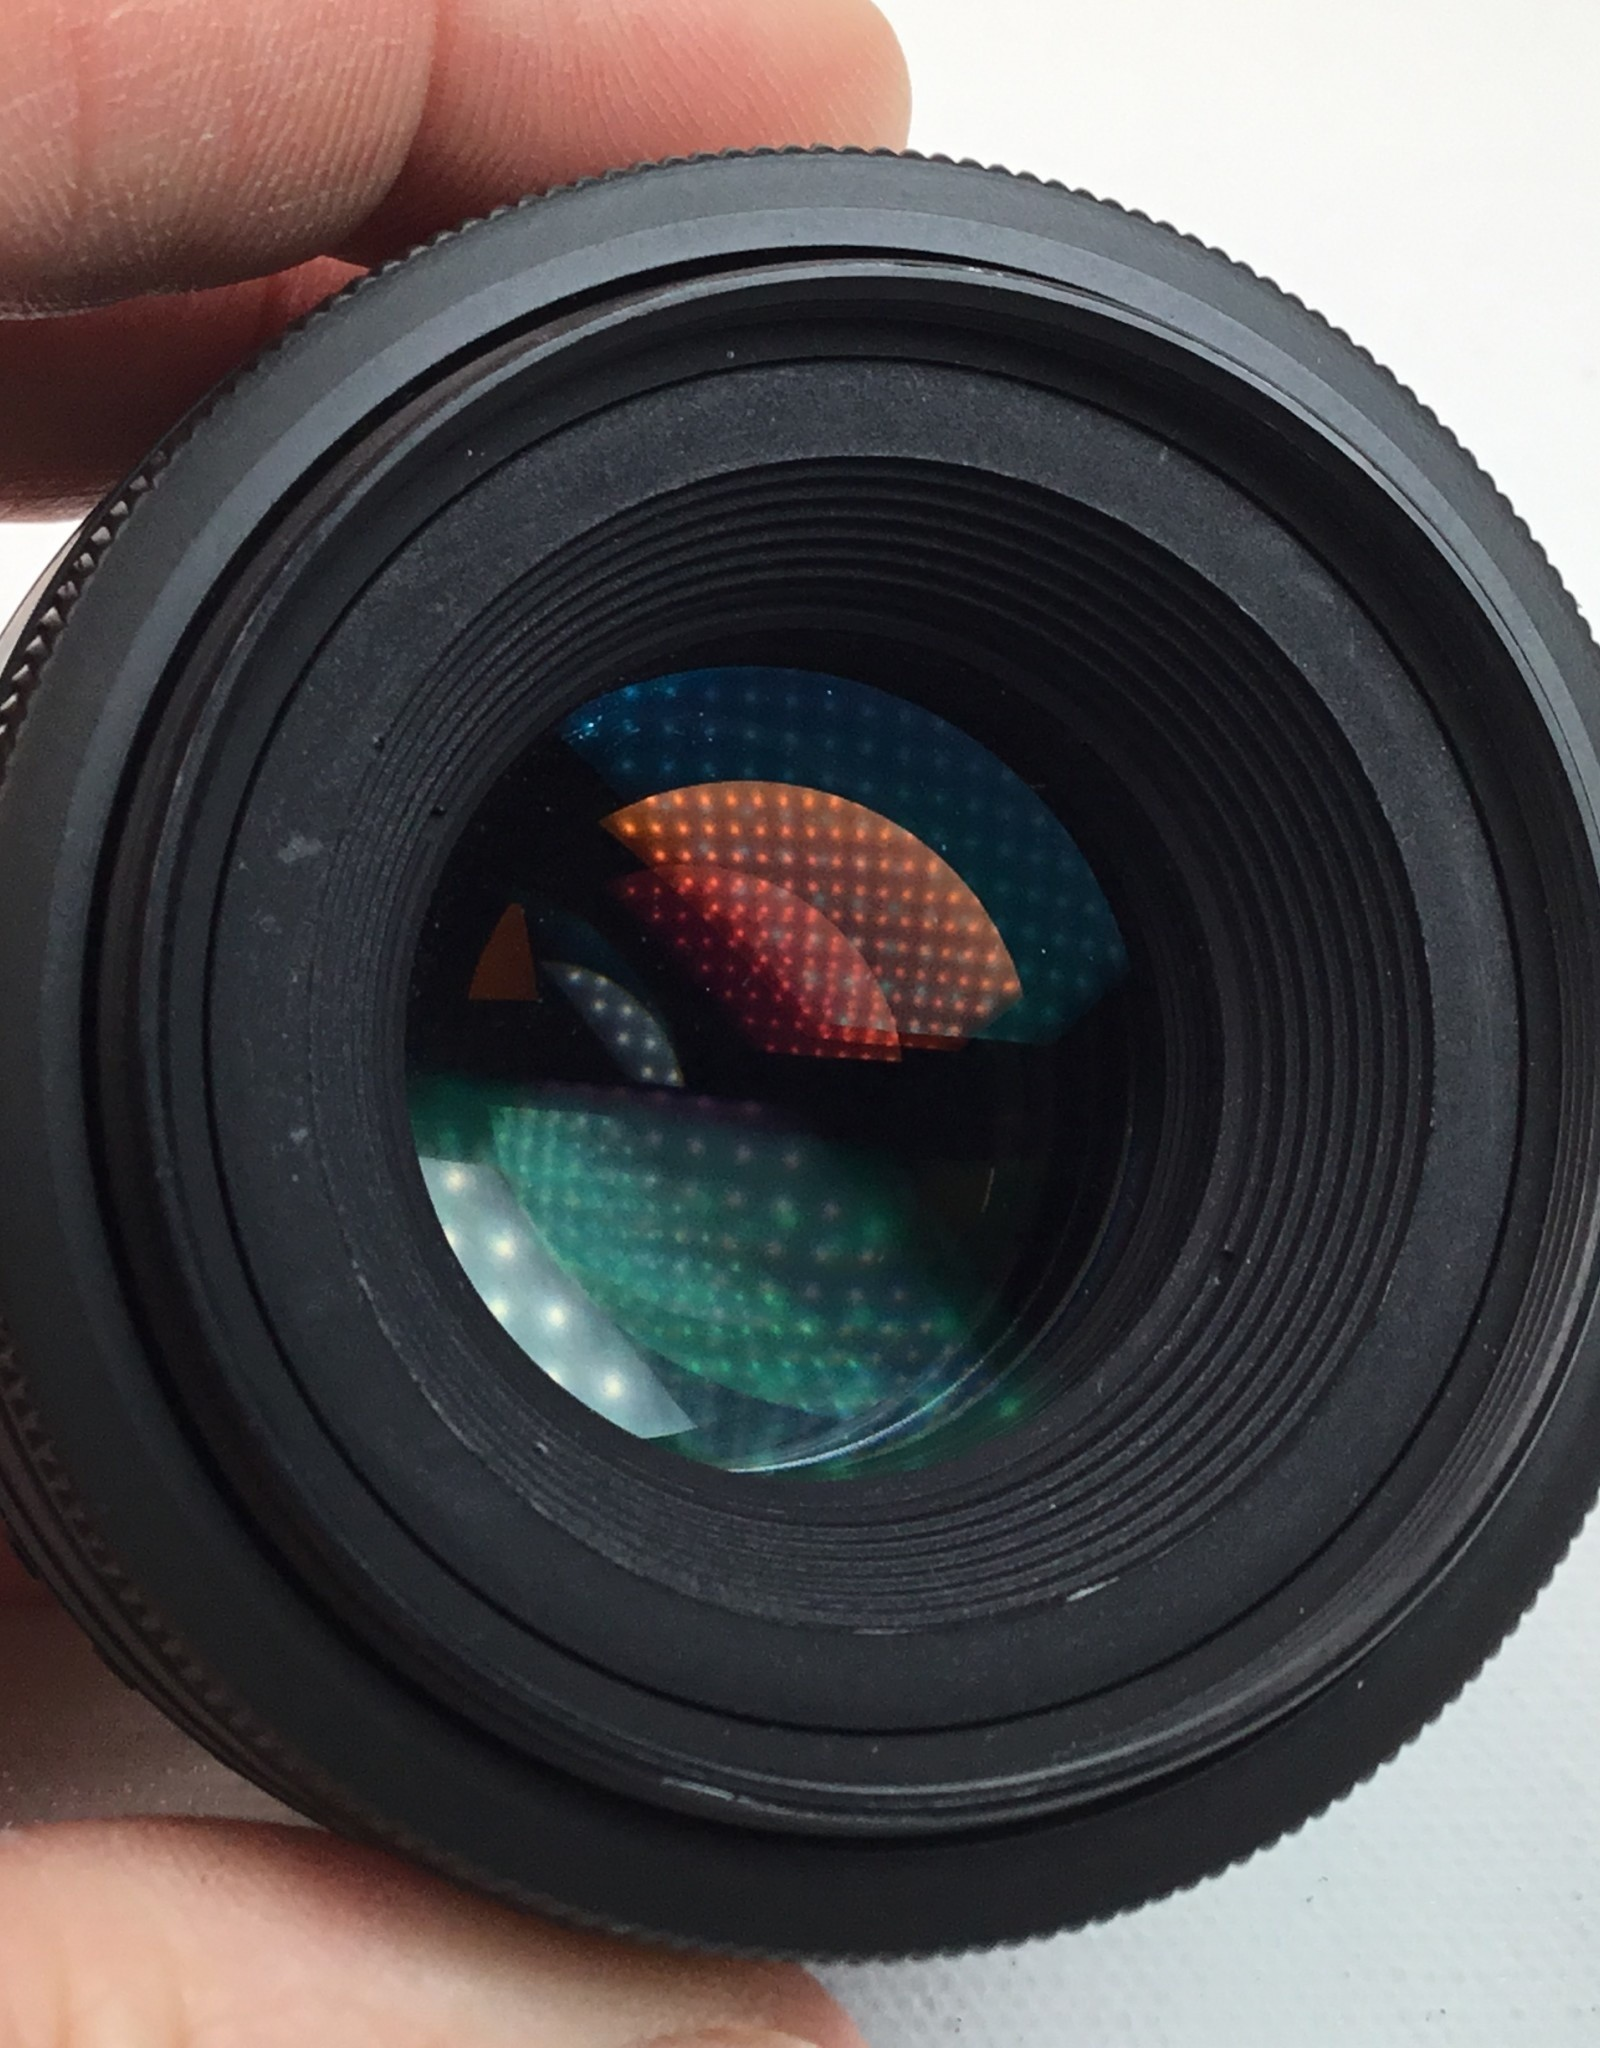 Pentax Pentax F SMC 50mm f1.7 Lens Used EX